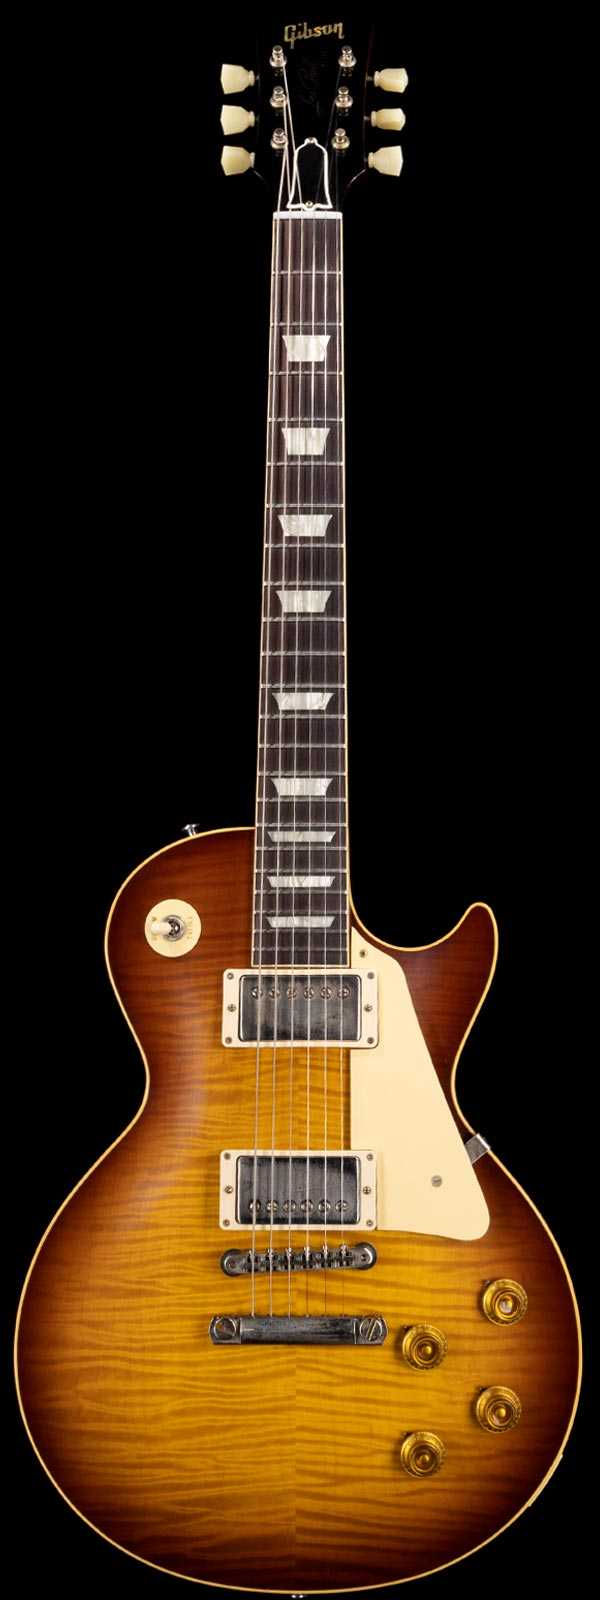 Gibson Custom Shop Made 2 Measure 1959 Reissue Les Paul Standard Dirty Lemon VOS